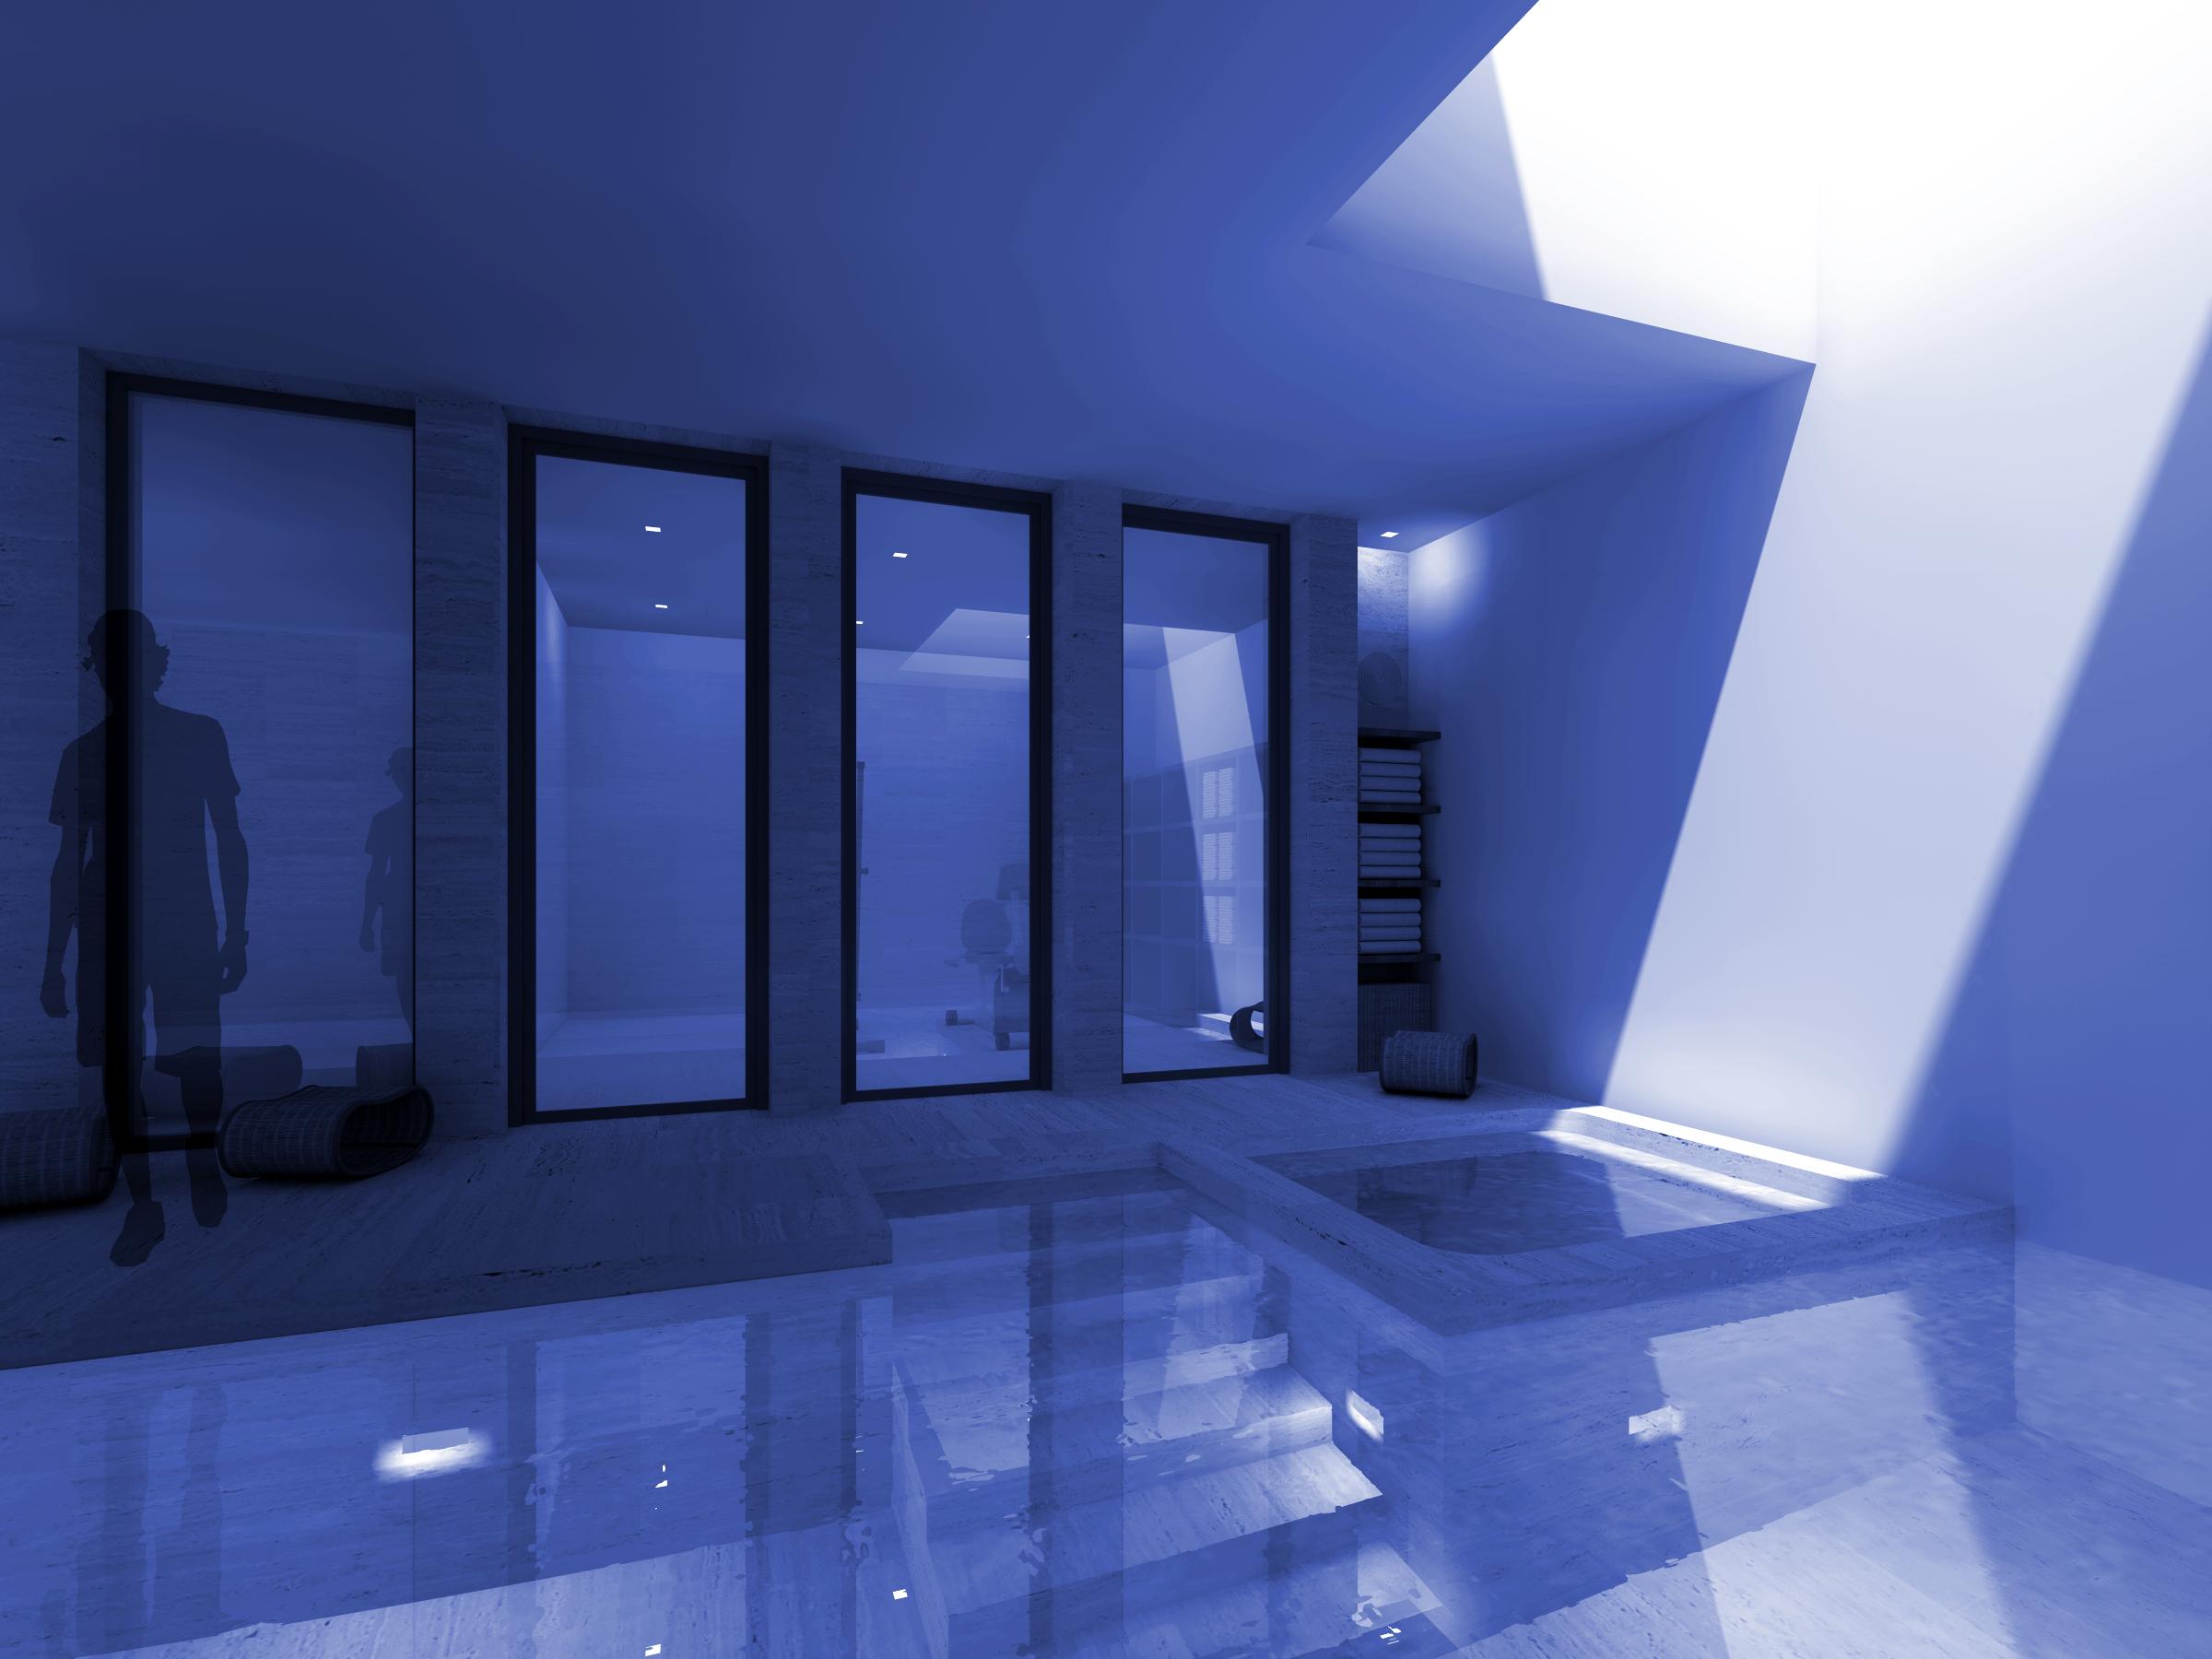 0809-basement-110603-scene8b.jpg